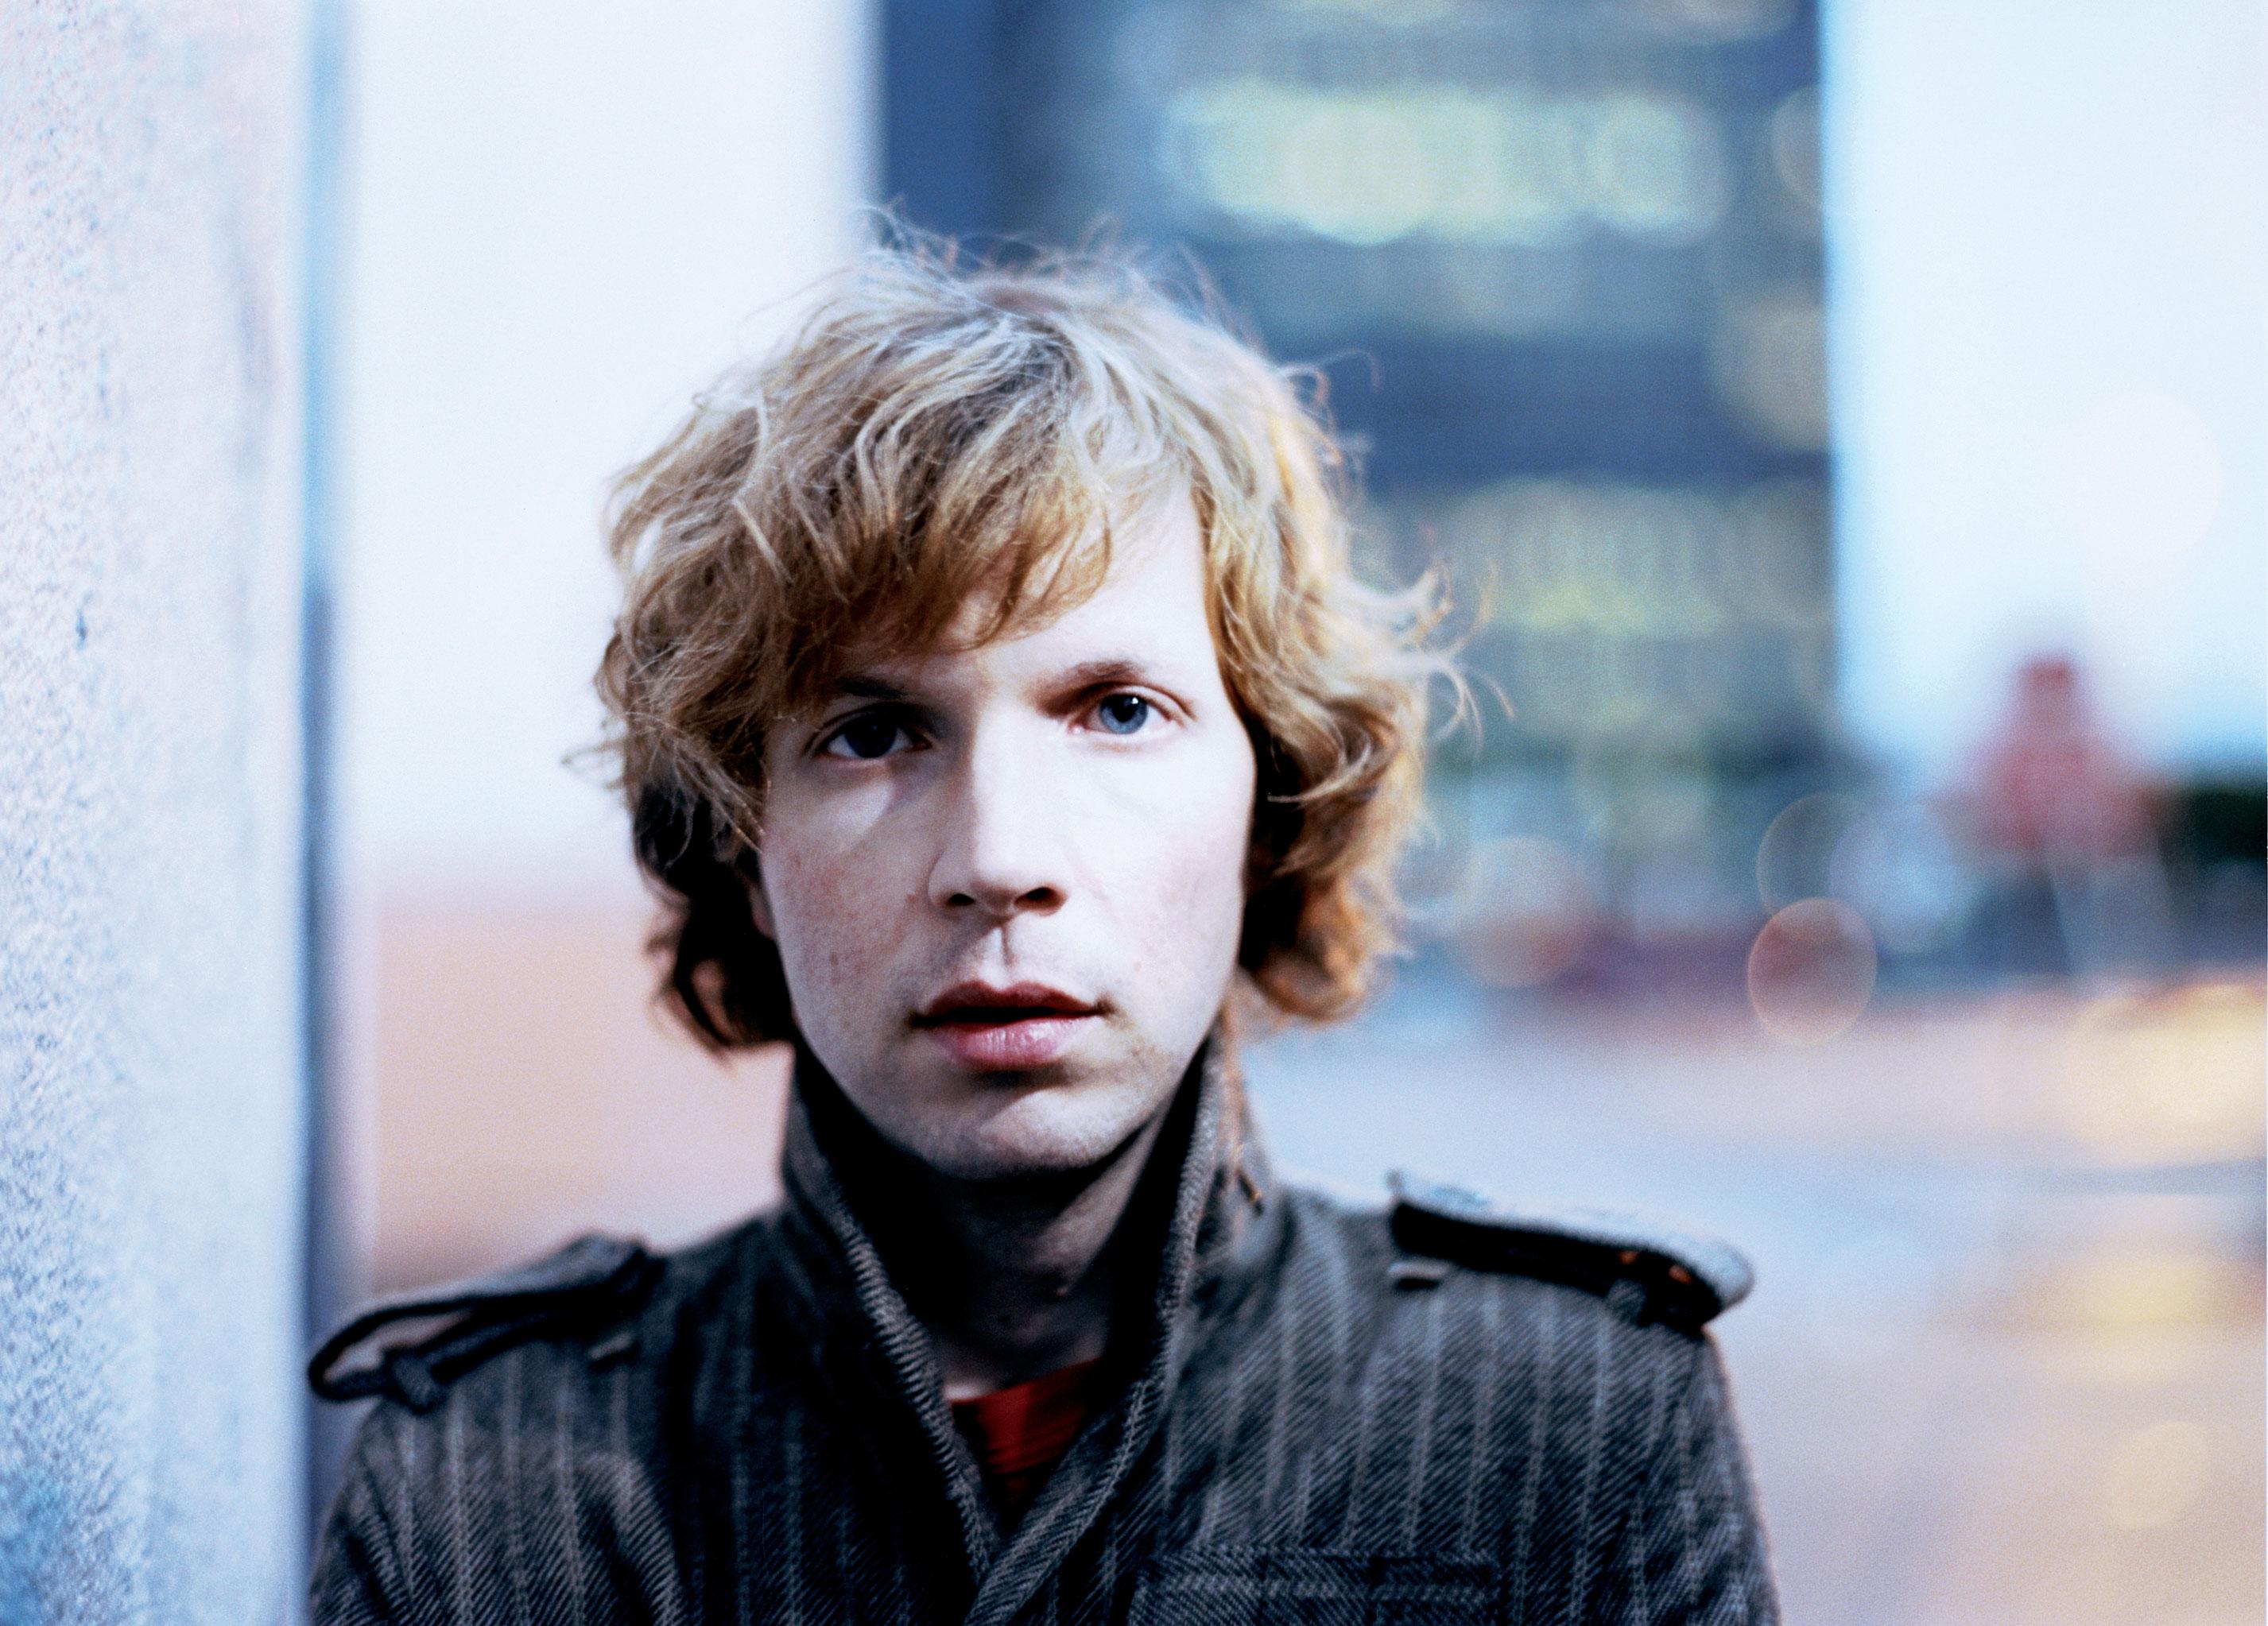 Beck net worth